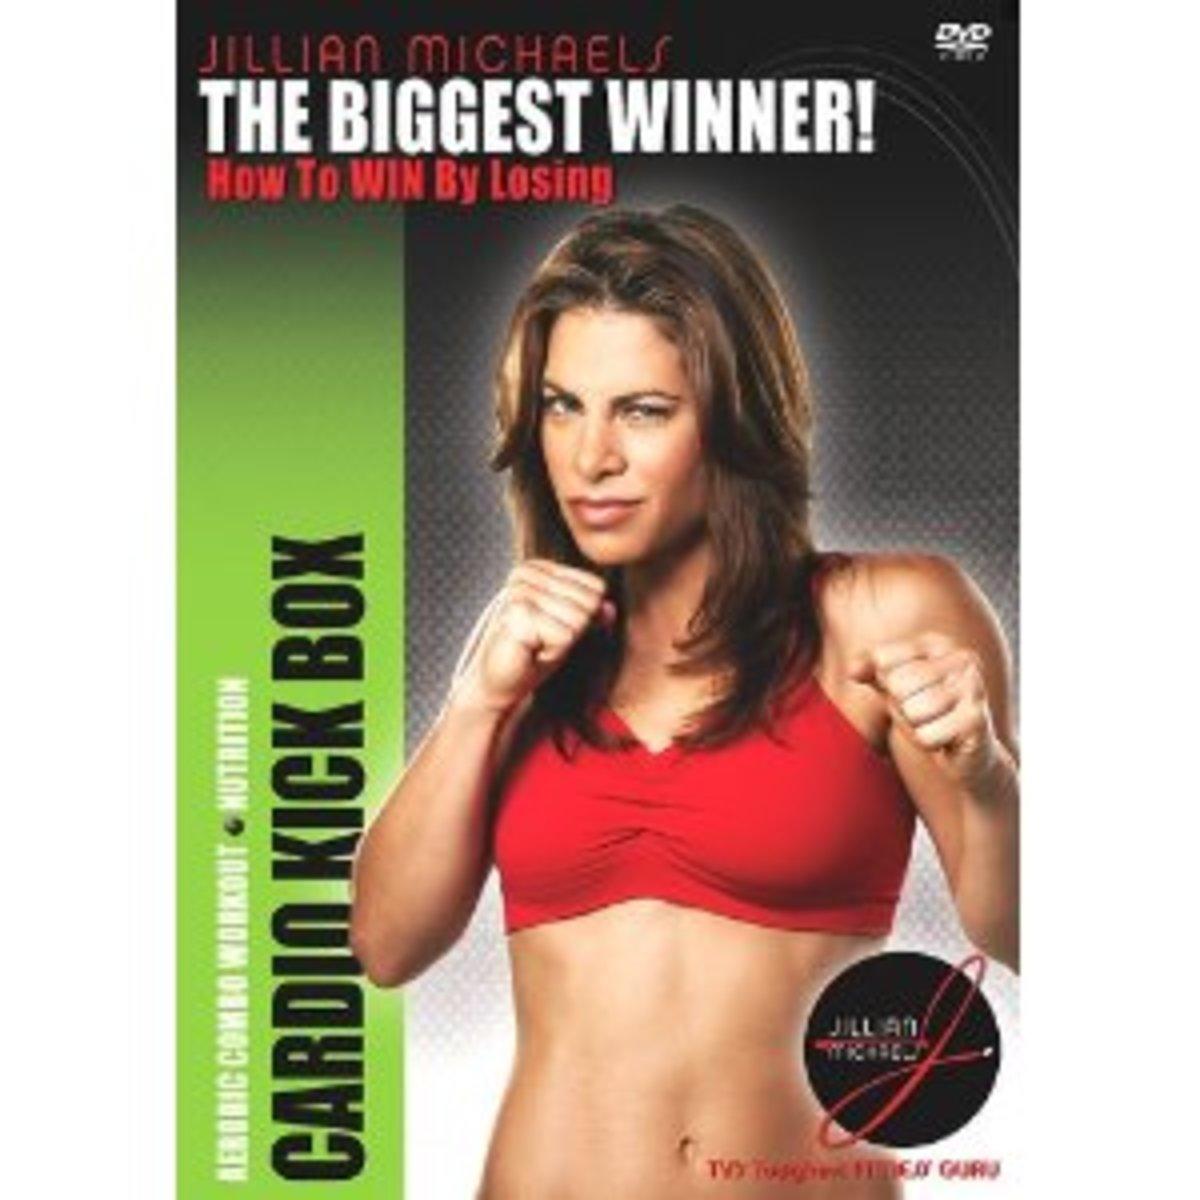 jillian michaels the biggest winner how to win by losing - cardio kickbox